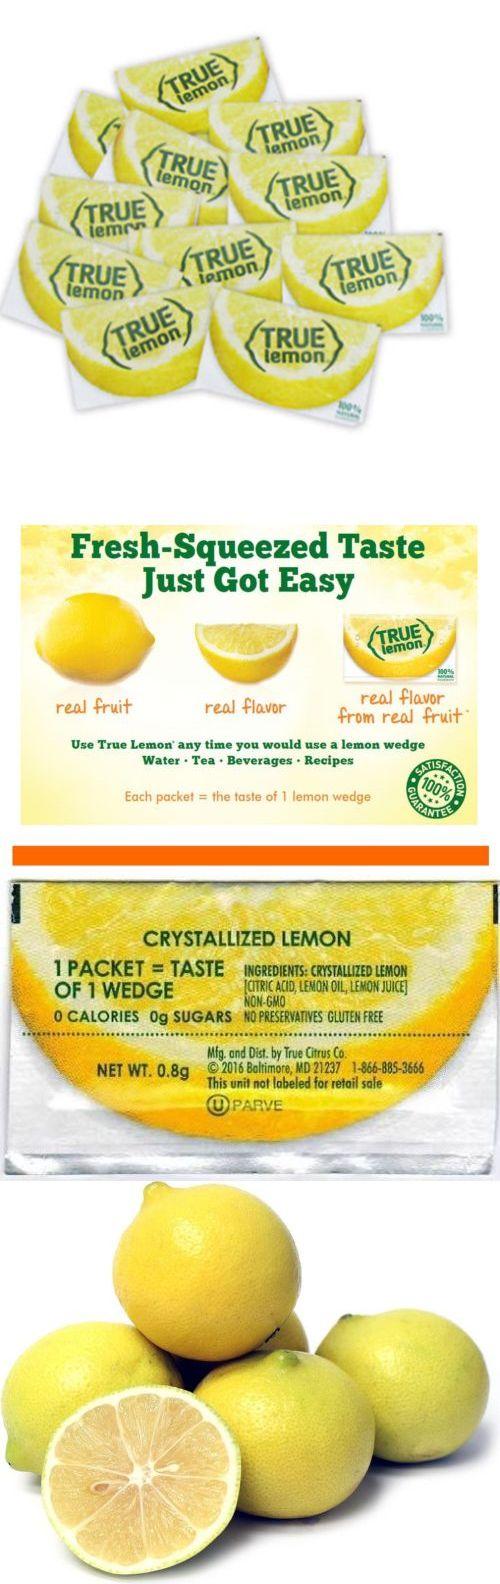 Drink Mixes 179192 True Lemon Bulk Pack 500 Count New Buy It Now Only 12 On Ebay Flavored Lemonade True Lemon Flavors